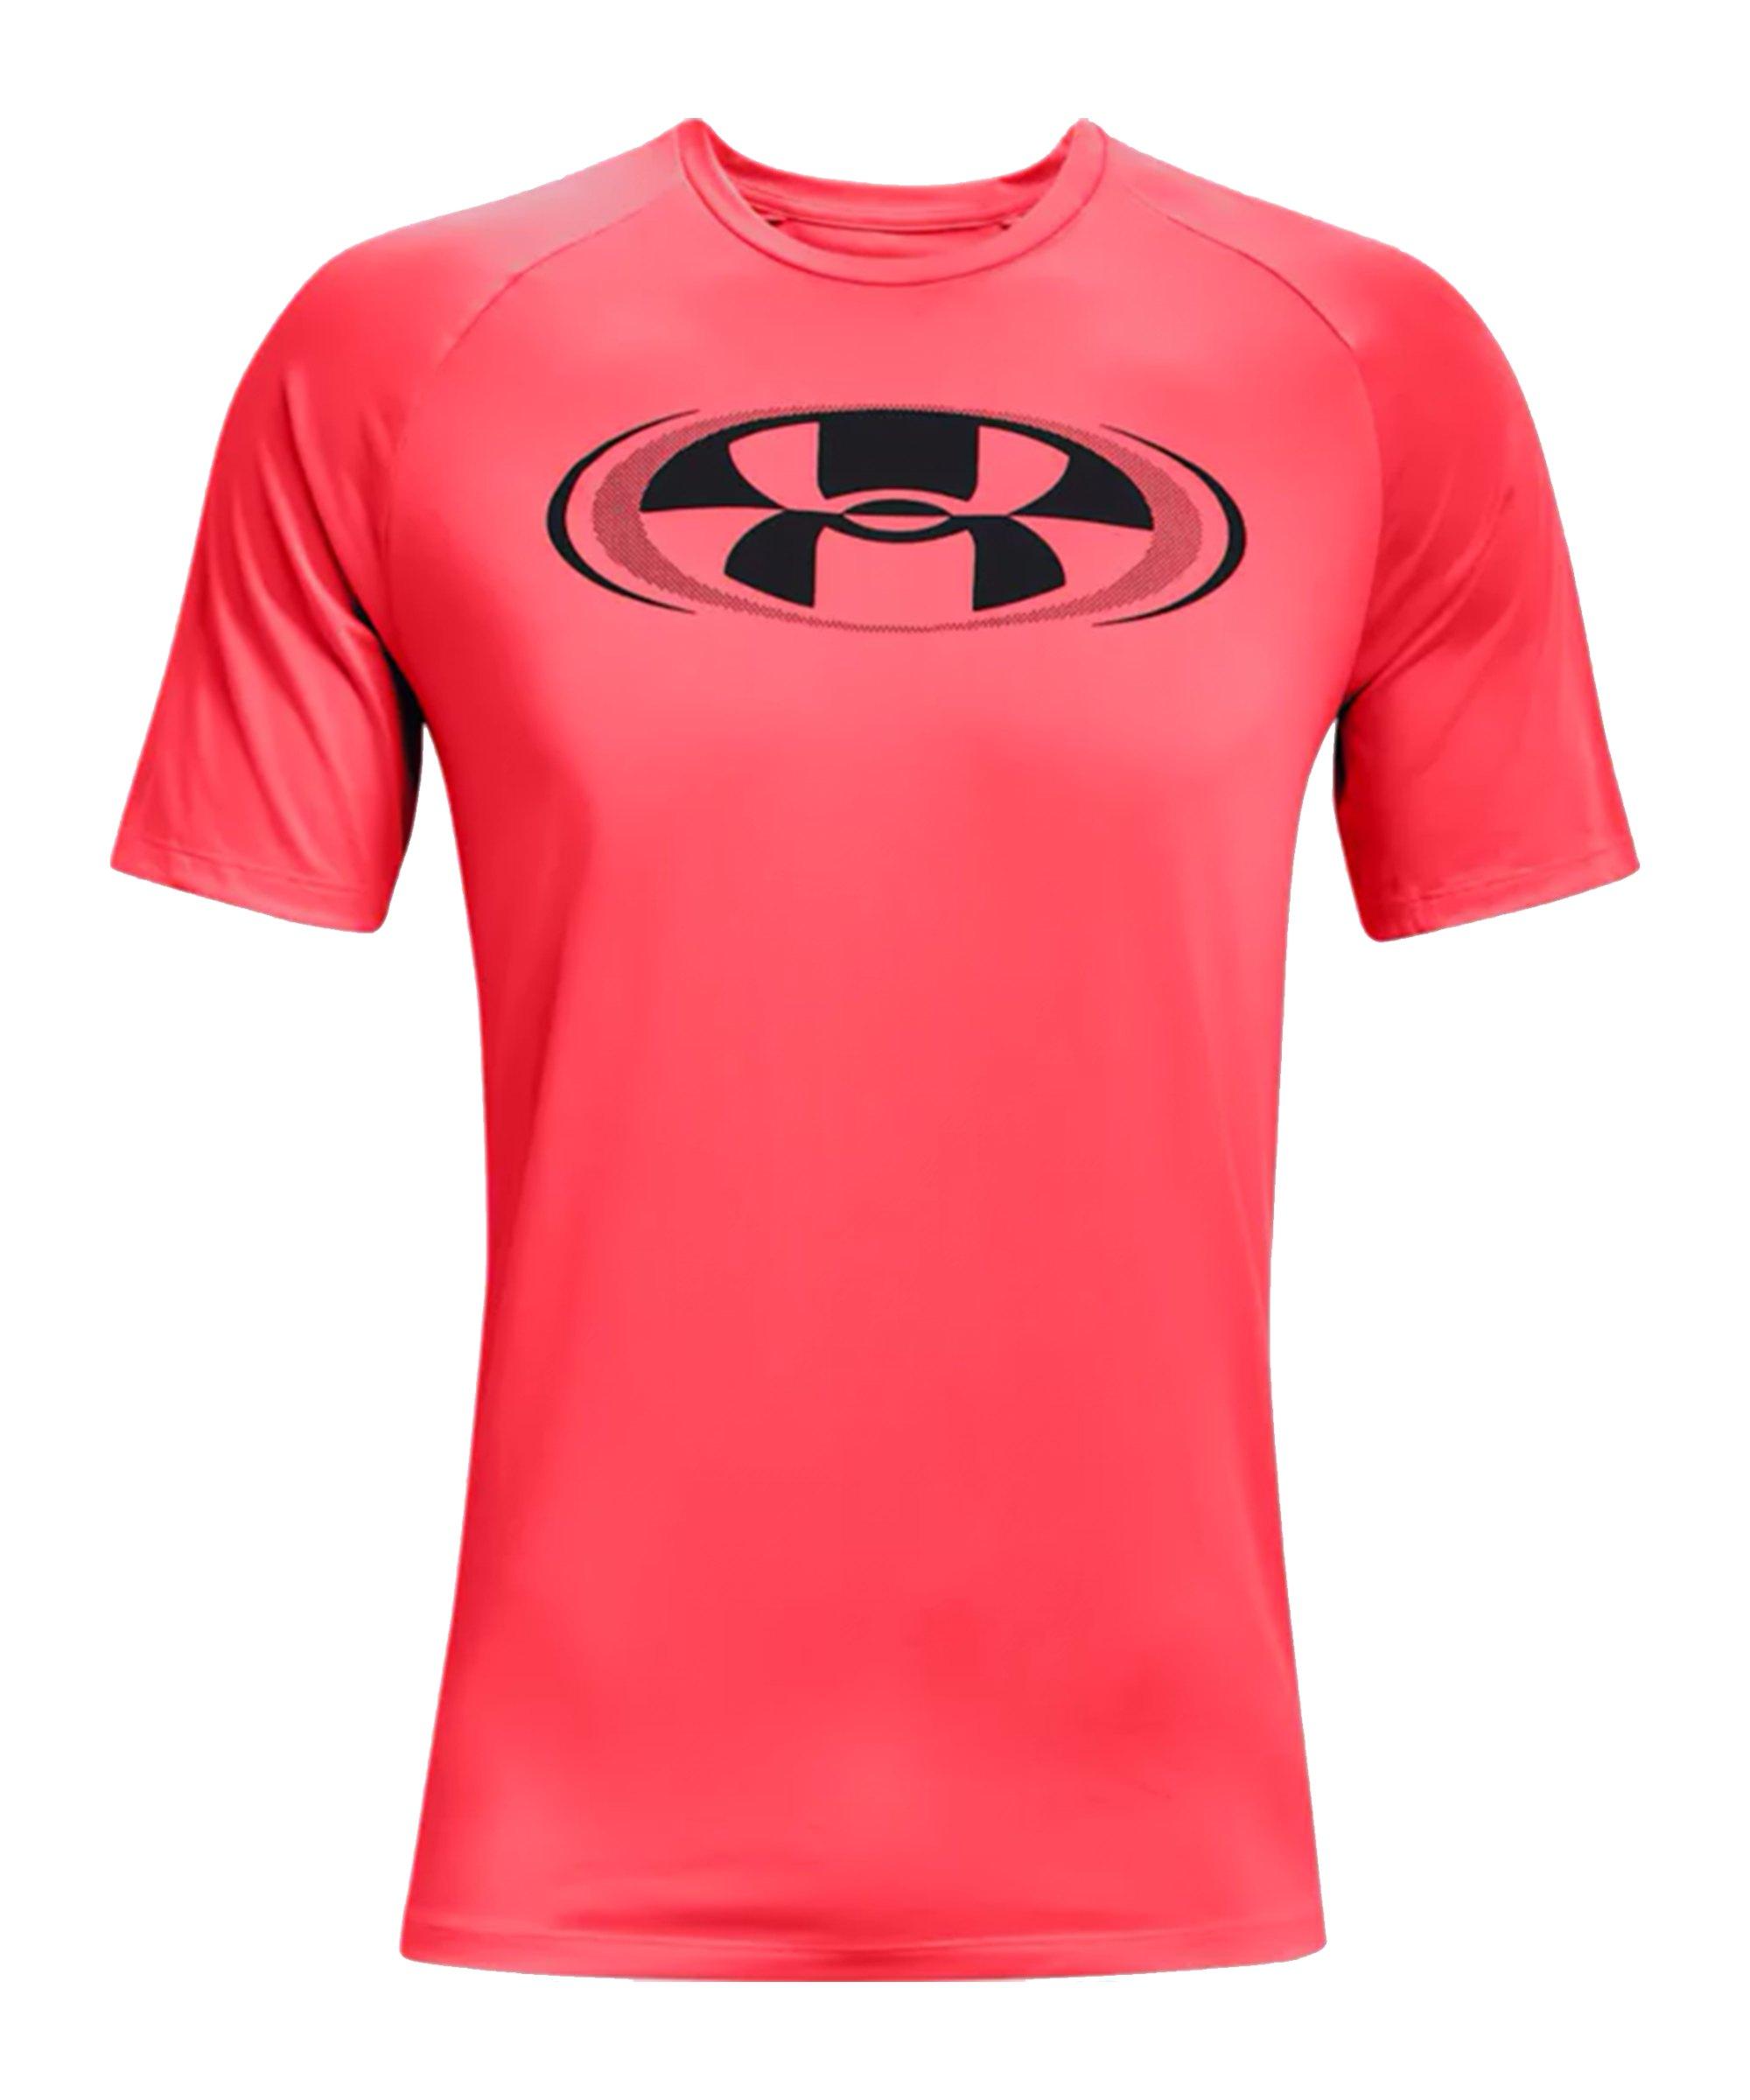 Under Armour Tech 2.0 Circuit T-Shirt Rot F628 - rot